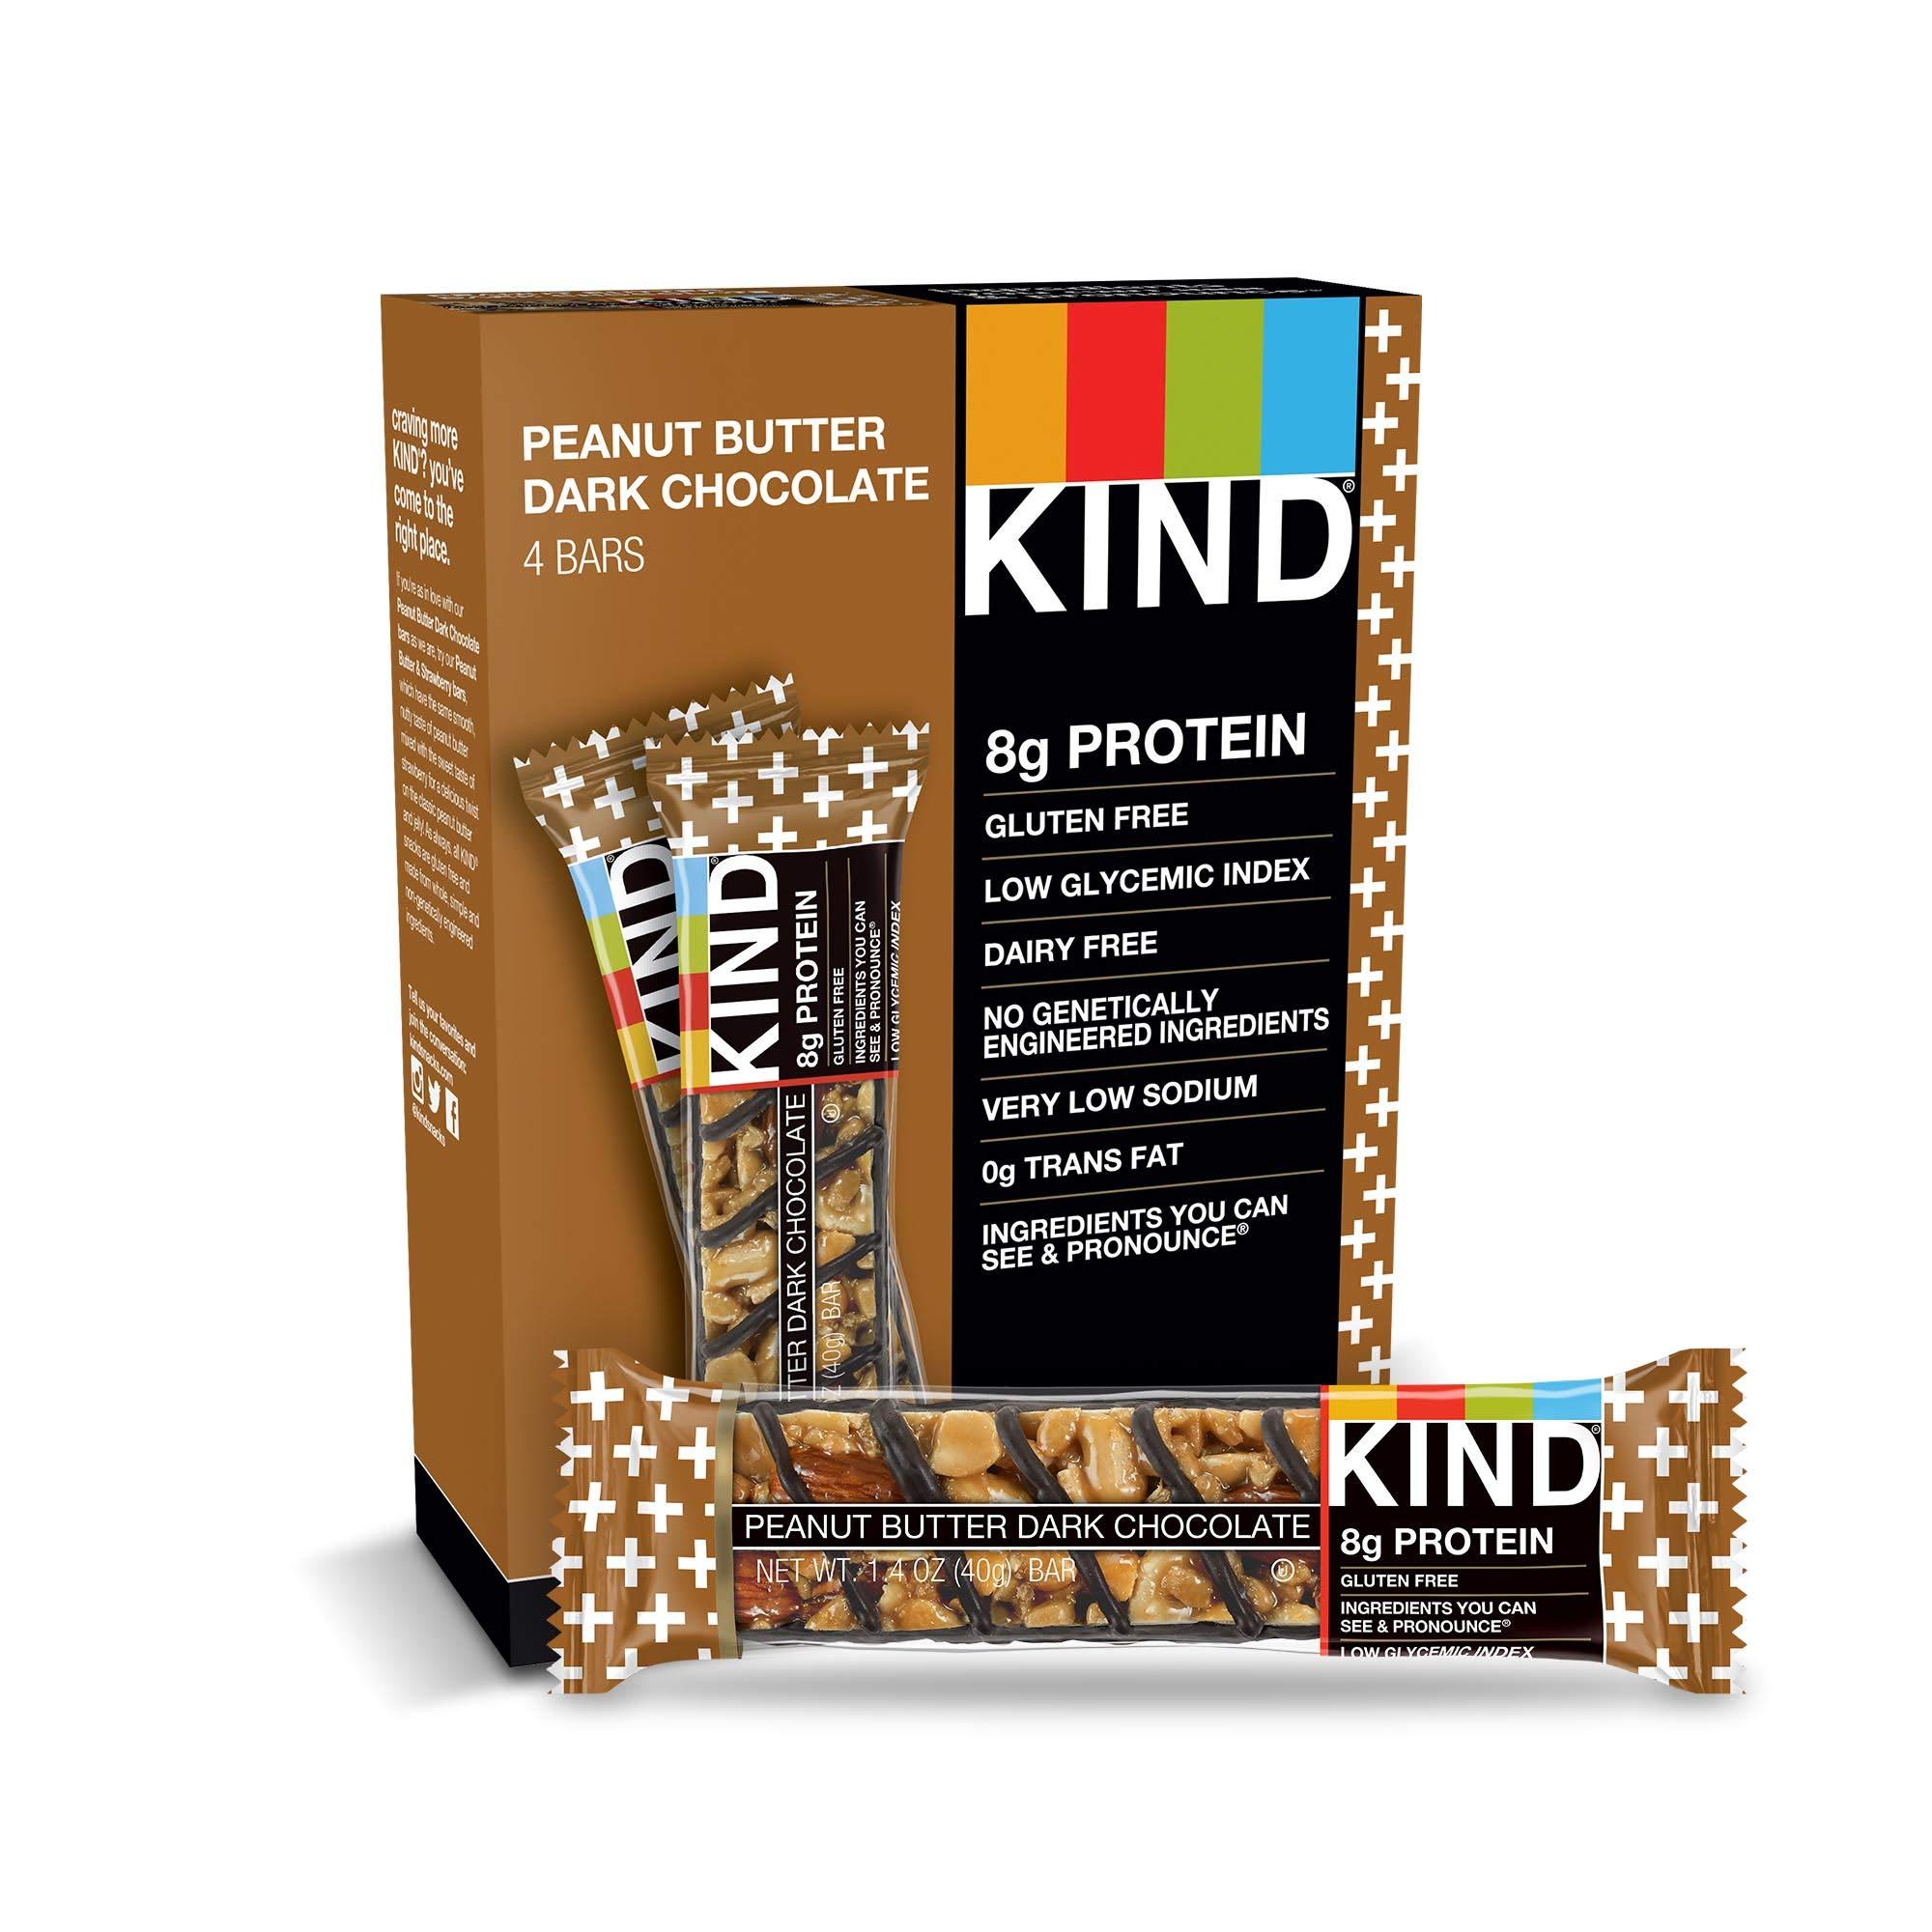 KIND Bars, Peanut Butter Dark Chocolate, 8g Protein, Gluten Free, 1.4 oz Bars, 48 Count